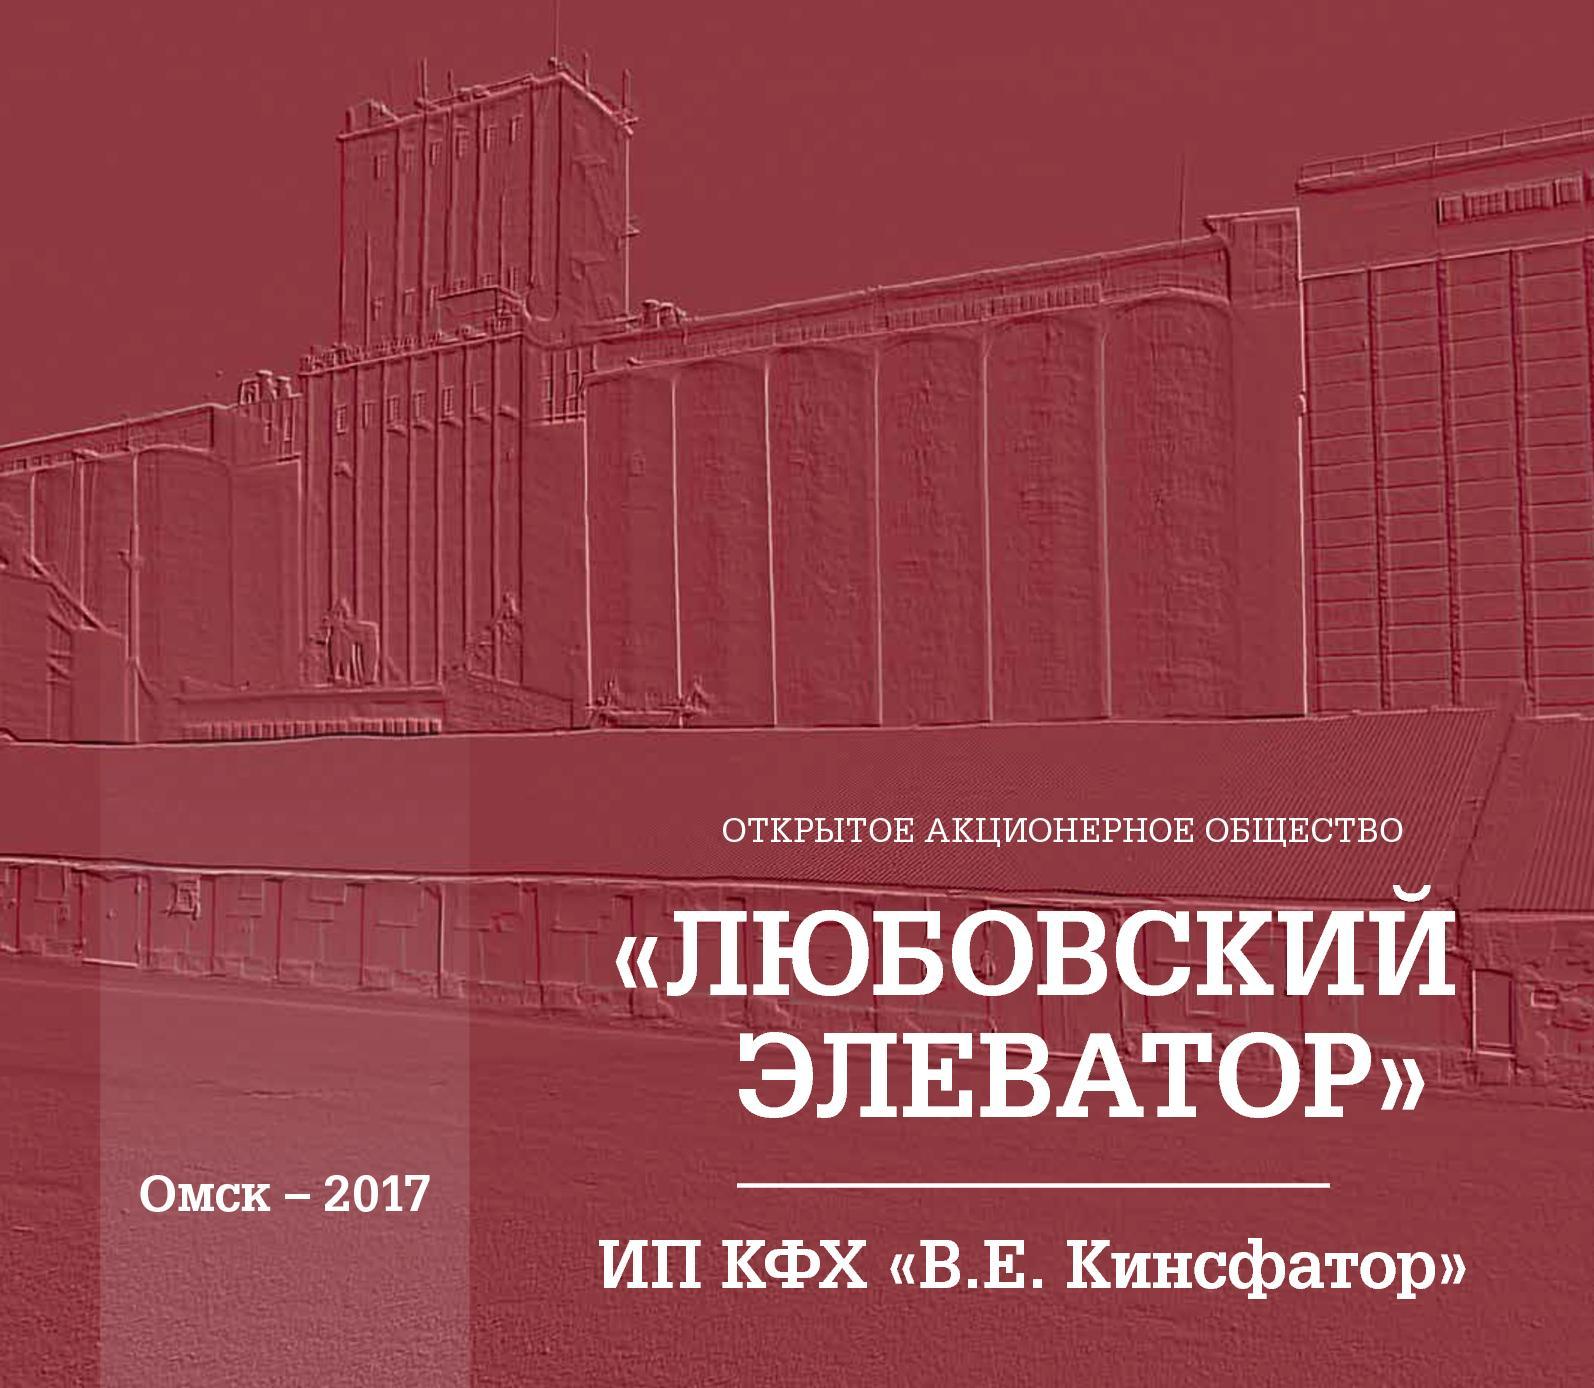 Бухгалтер на элеватор элеватор пермского края